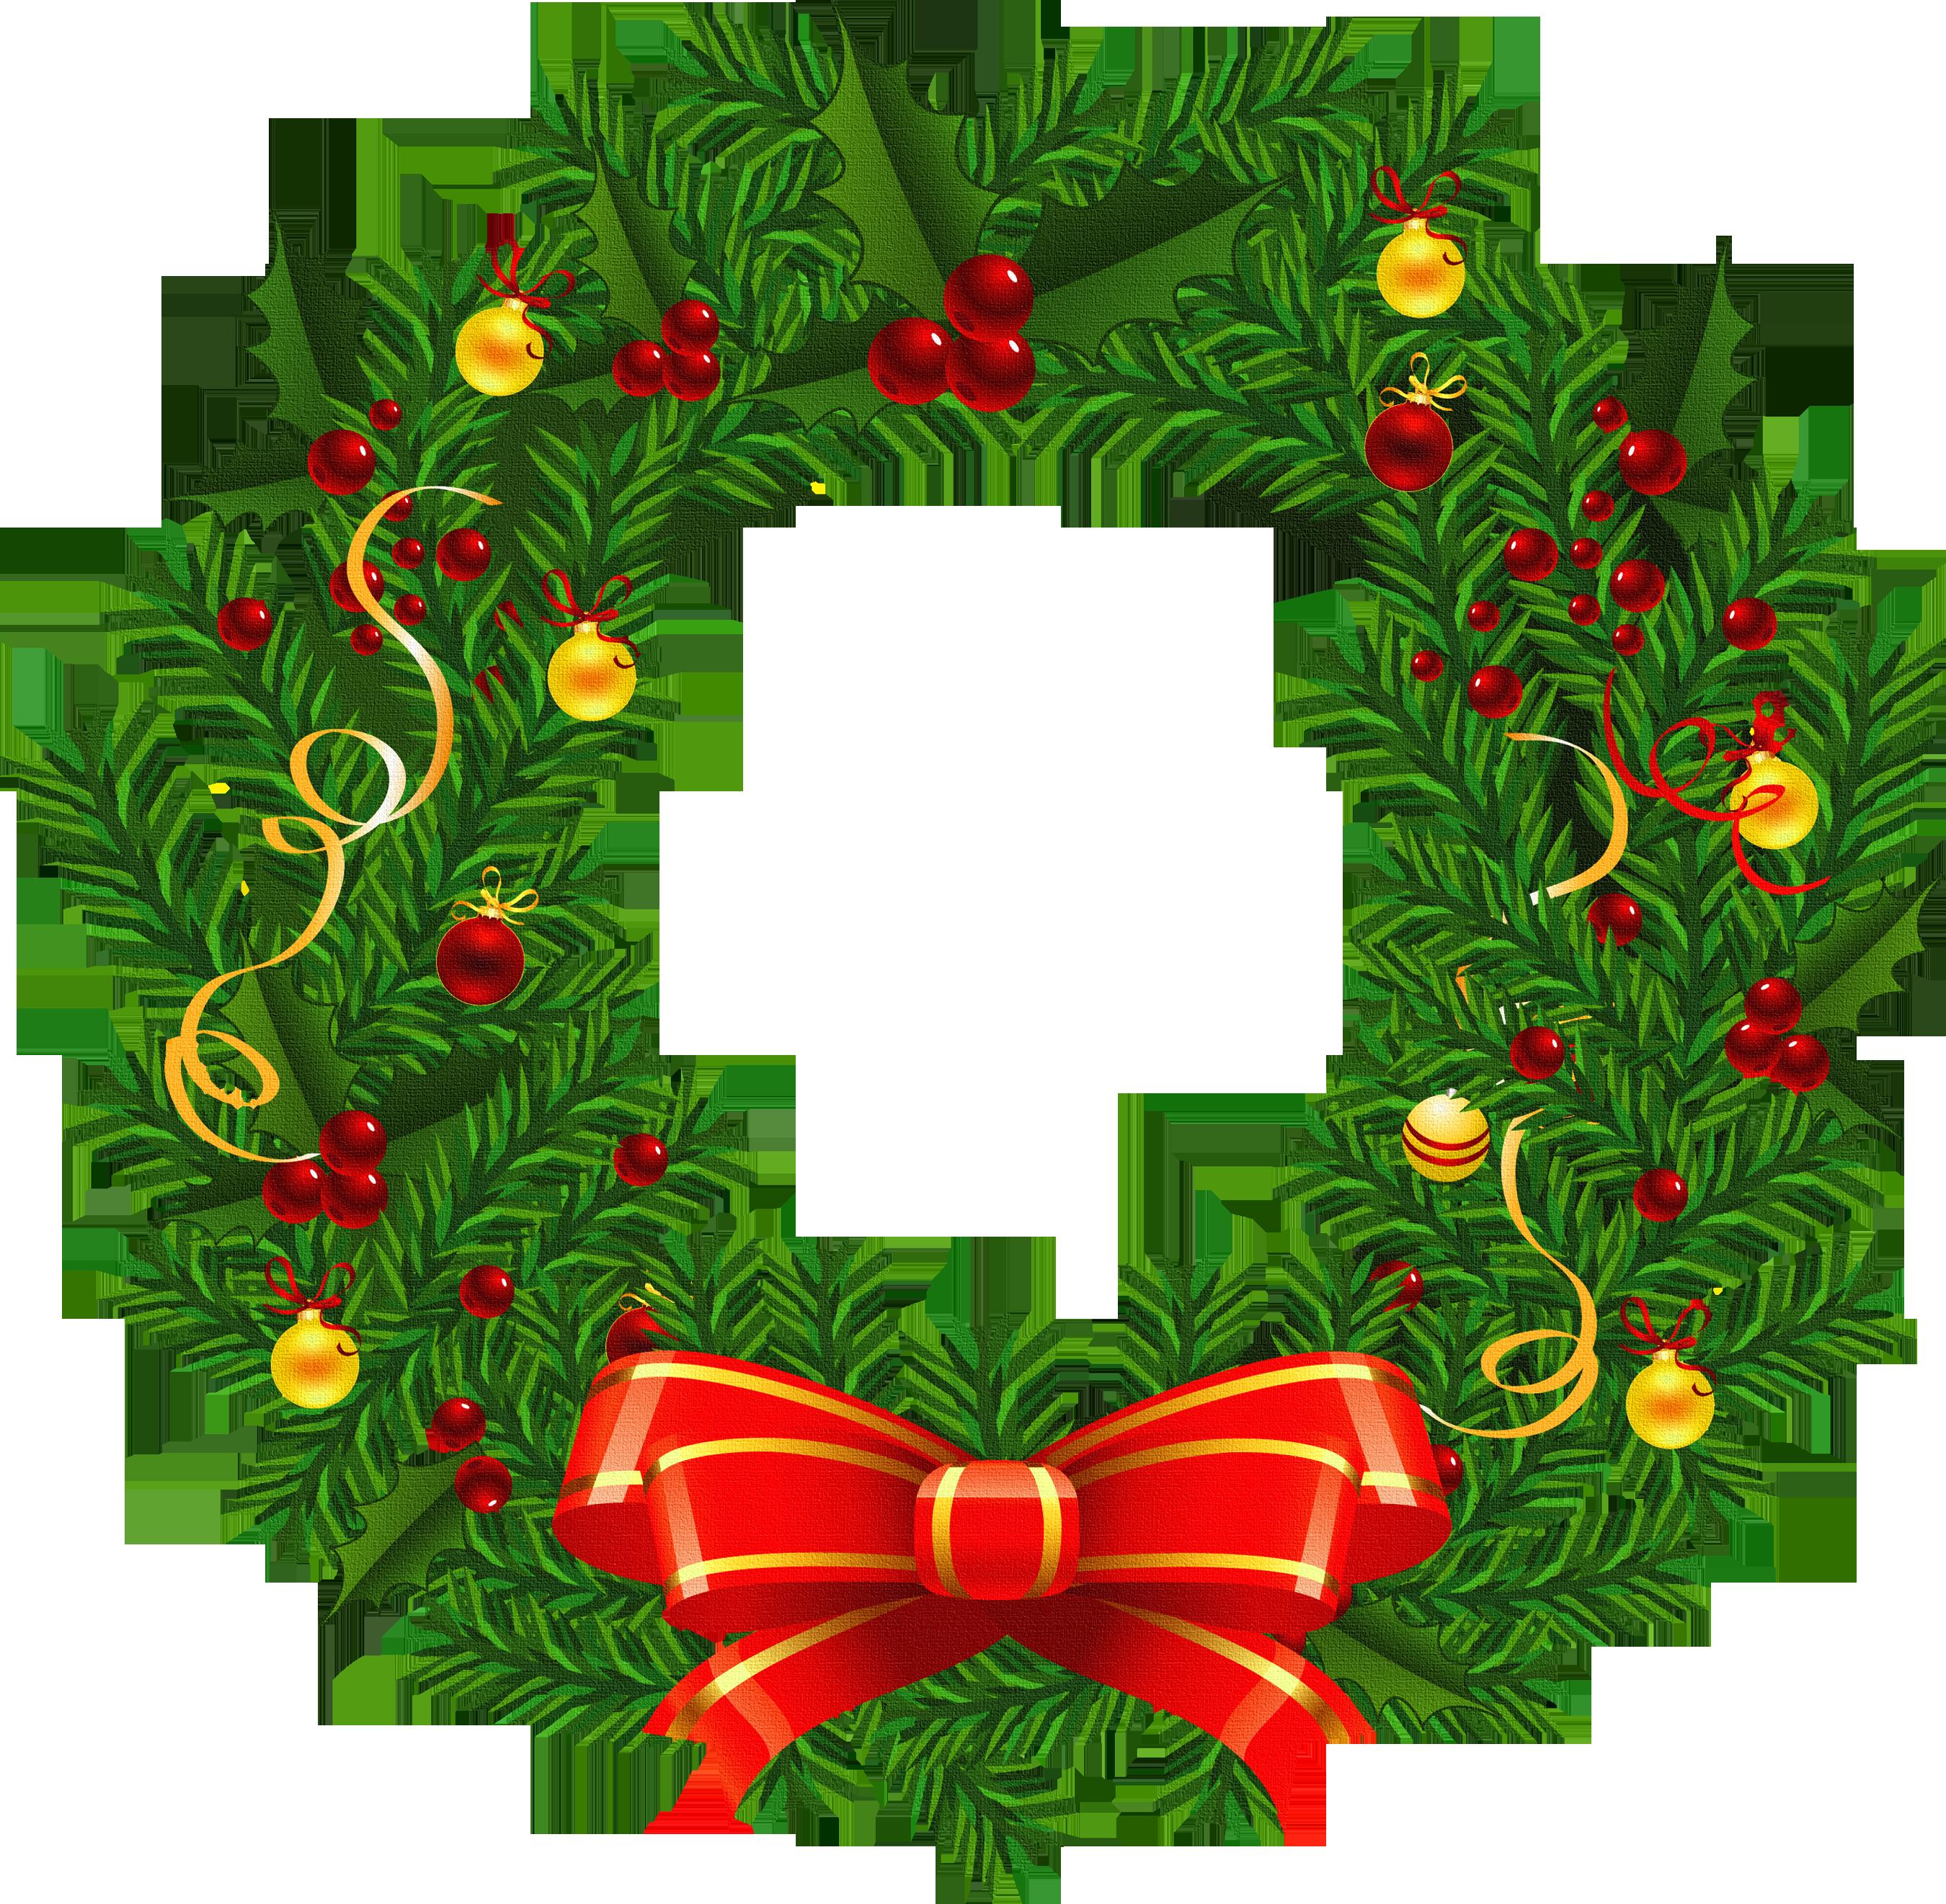 Christmas Wreaths Pictures Clip Art Clip-Christmas Wreaths Pictures Clip Art Clipart Best-2